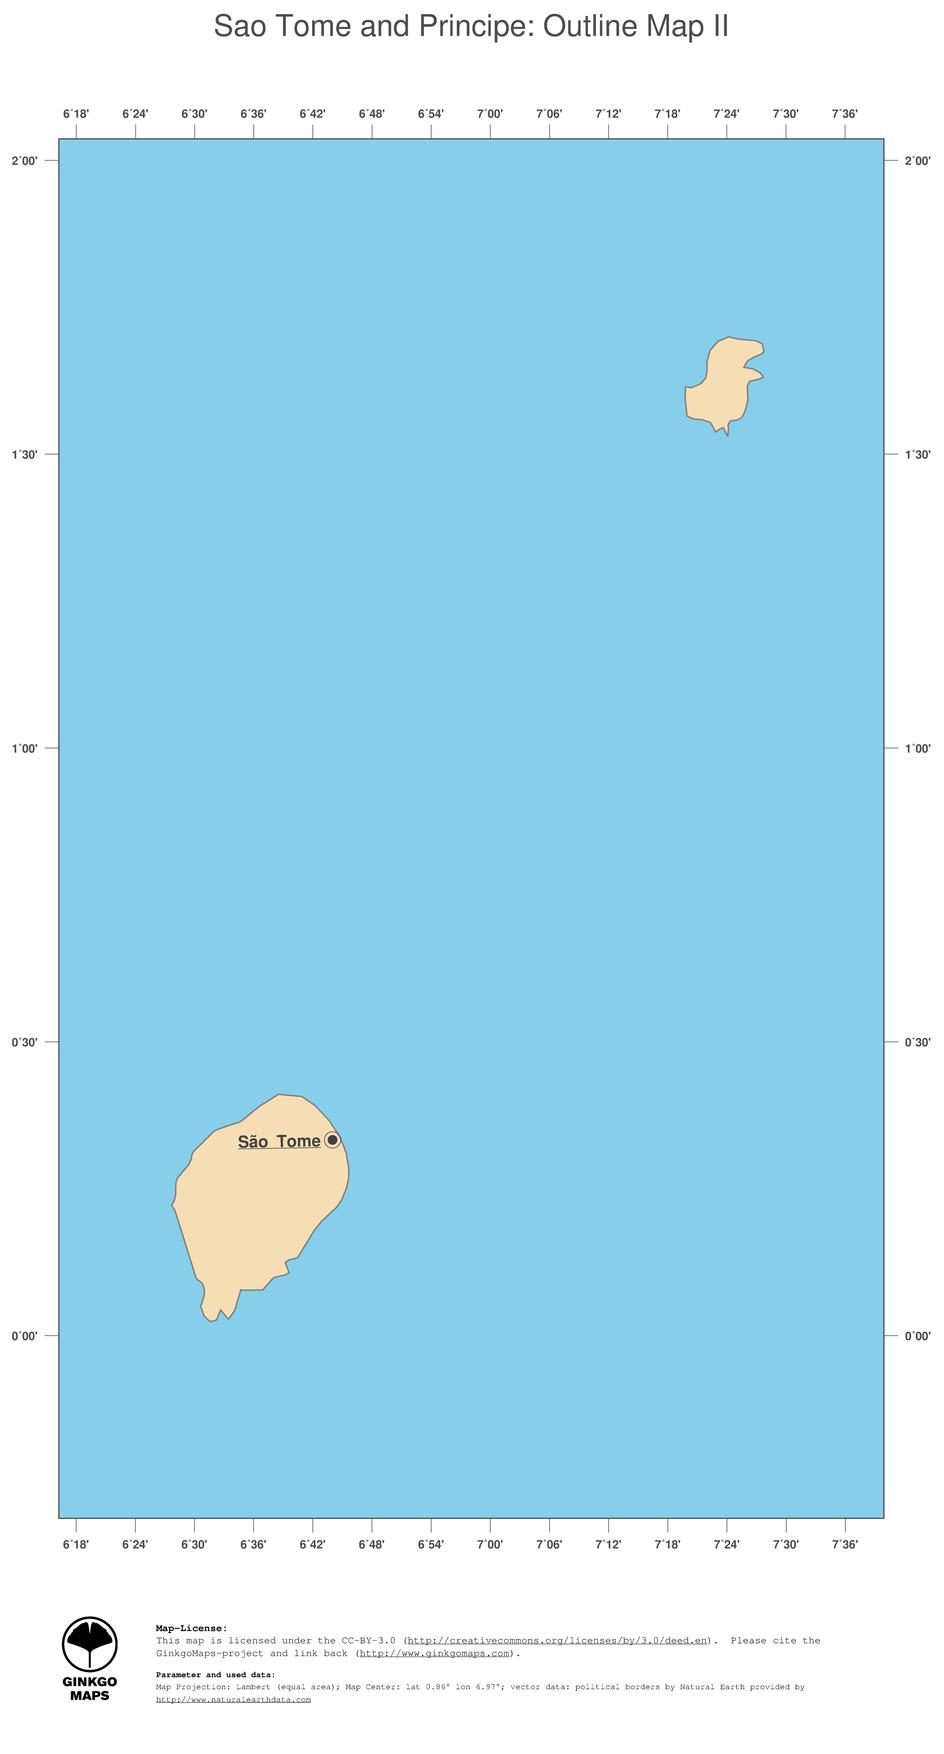 Map Sao Tome and Principe GinkgoMaps continent Africa region Sao